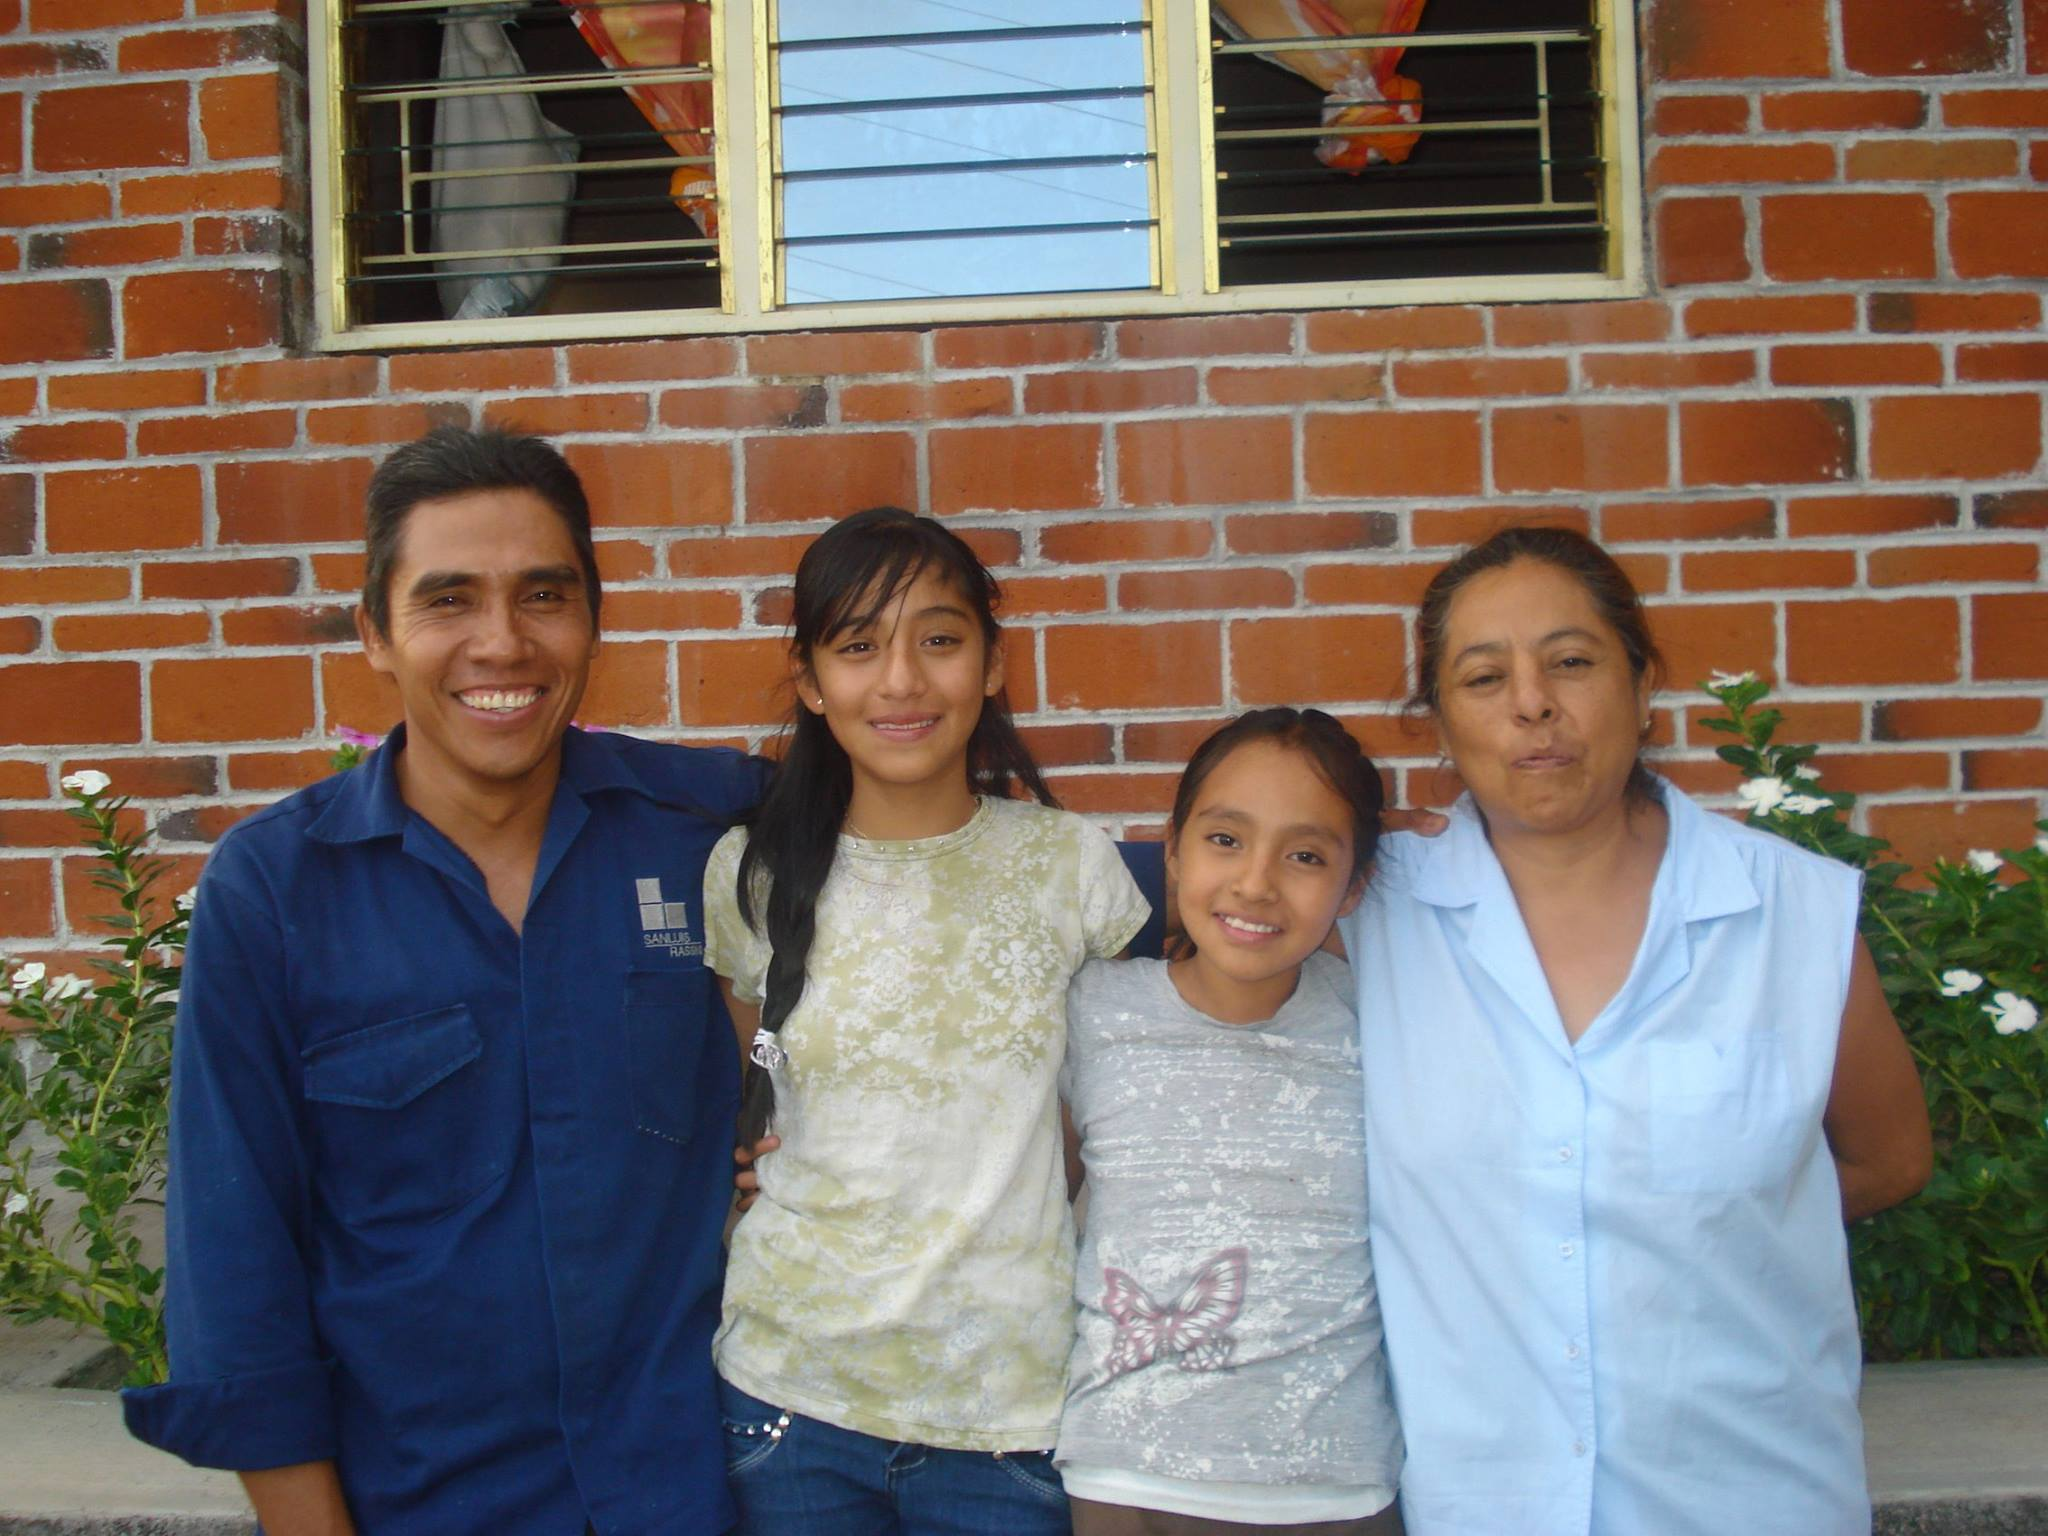 Agapito, Zabdi, Noemí, and Elsa Osorio, missionaries in San Pablo Anicano, Puebla, Mexico